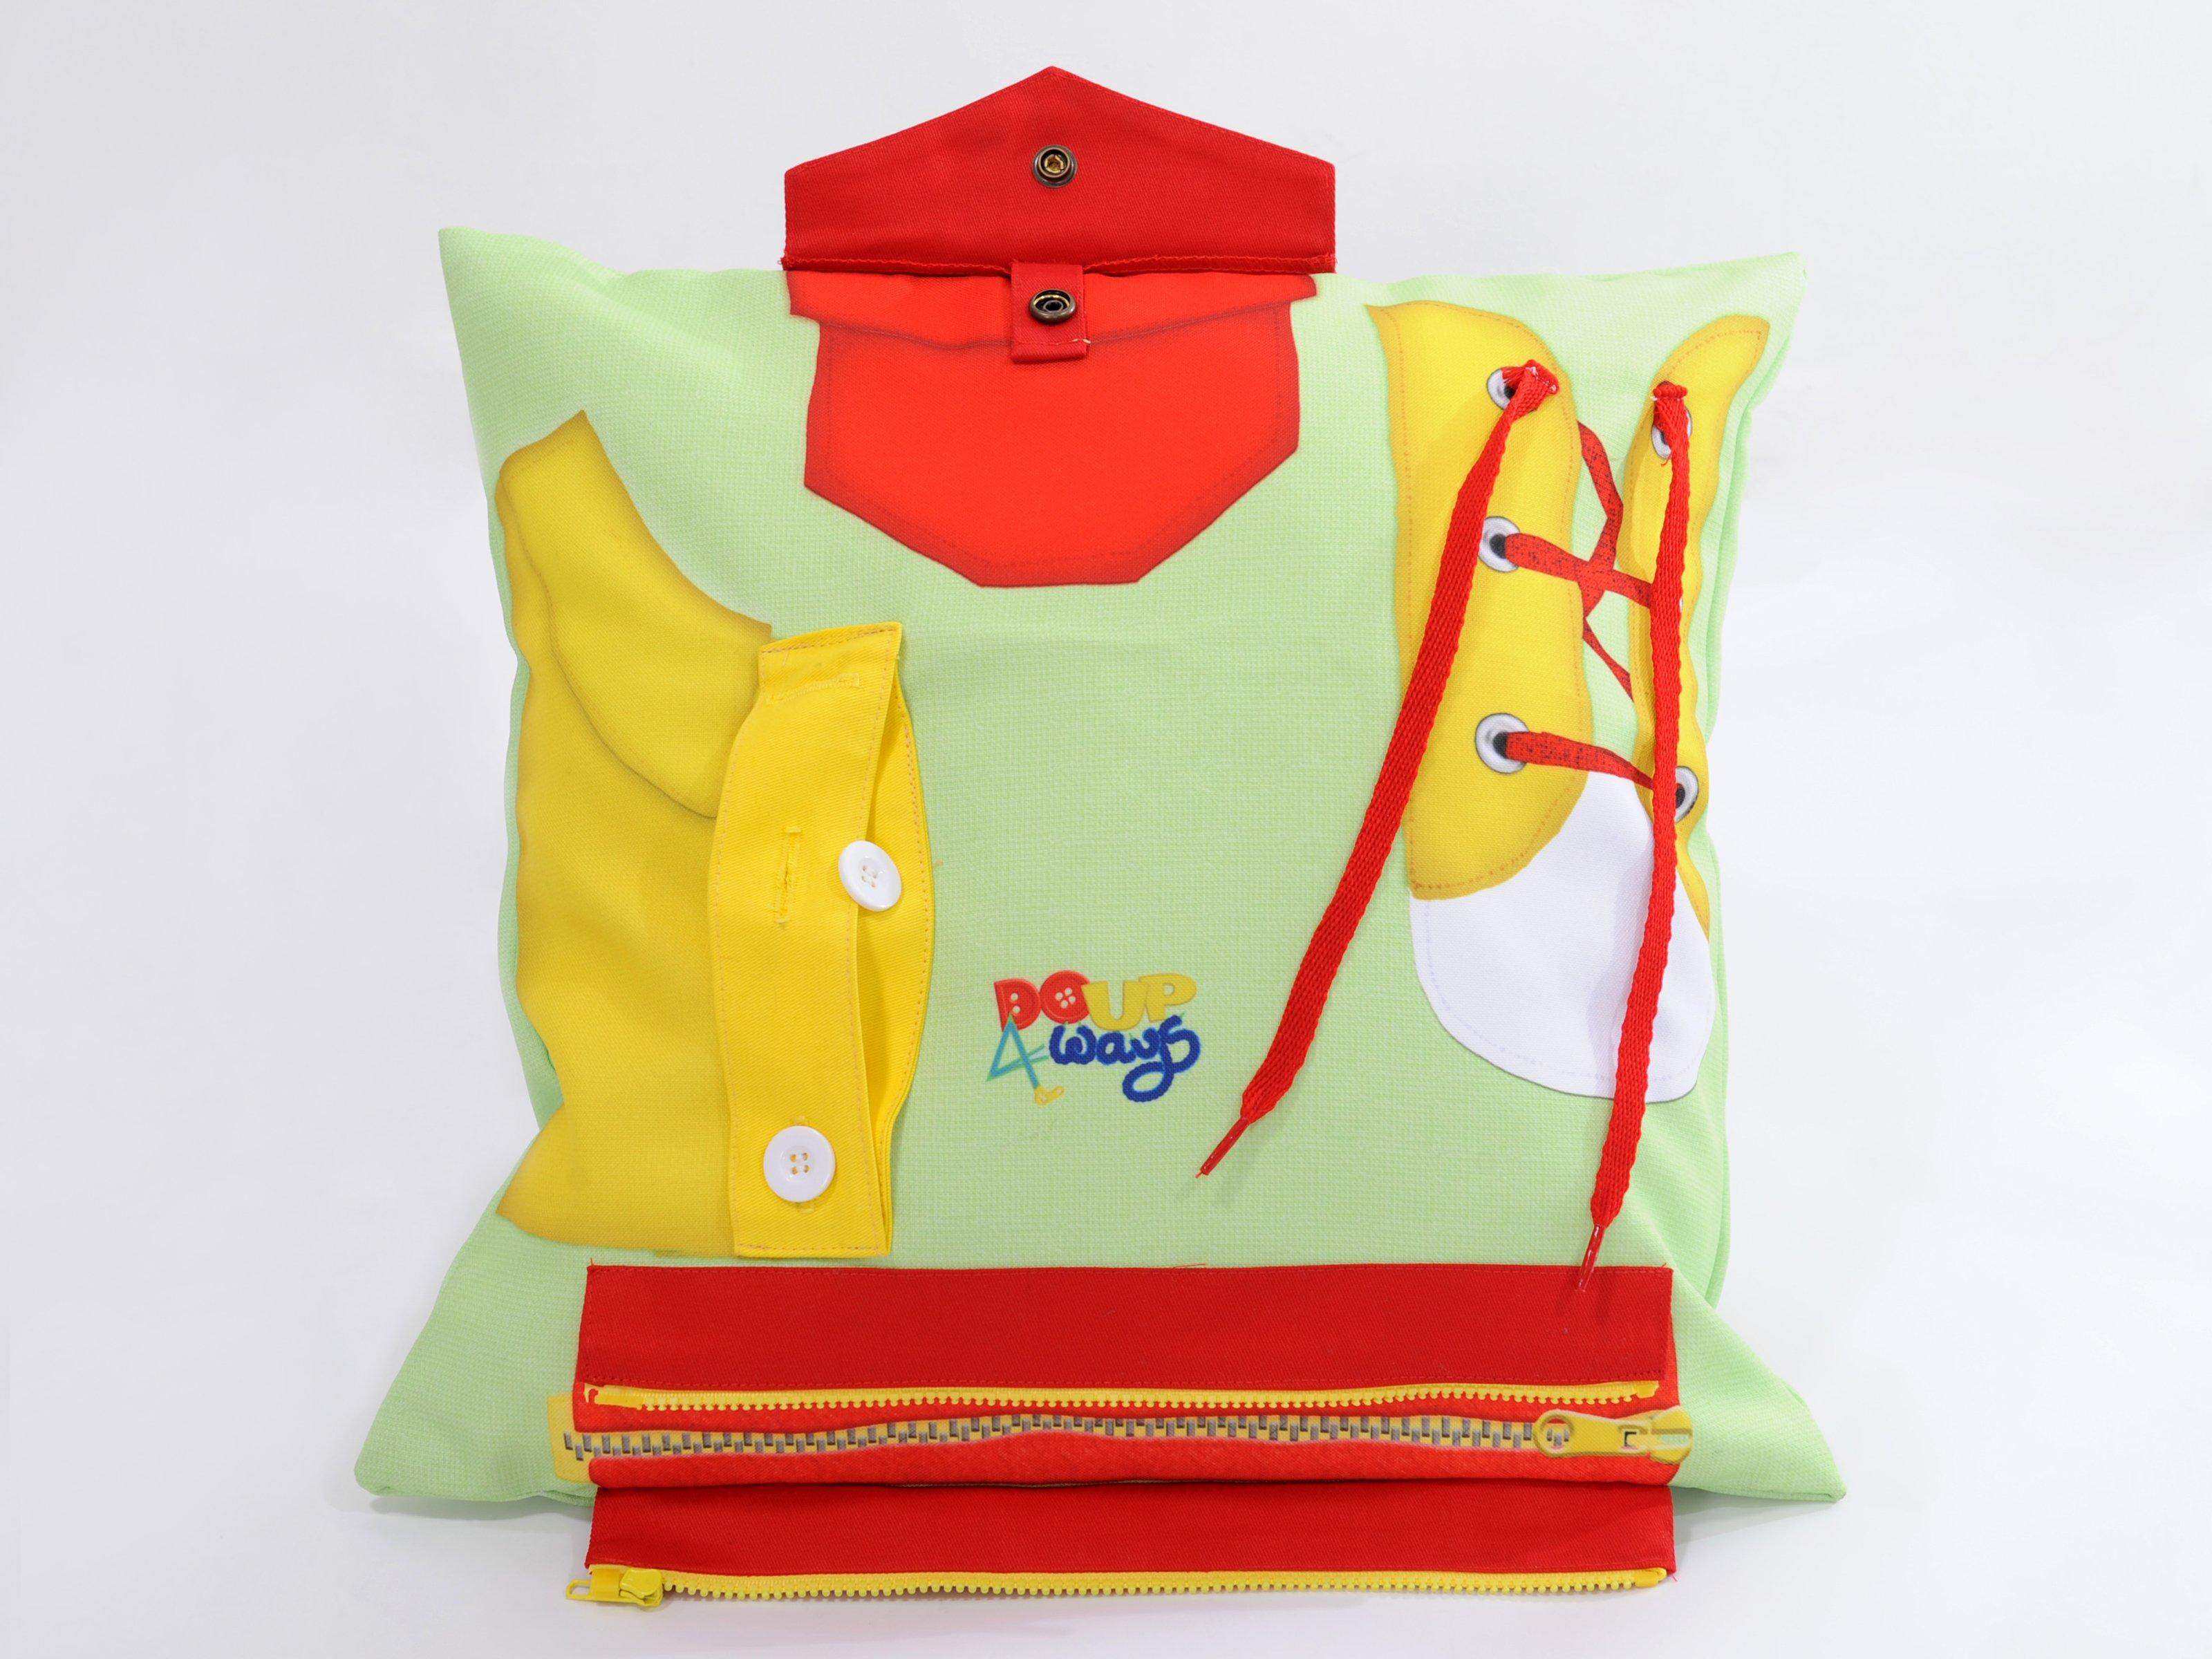 DoUp4Ways interactive cushion